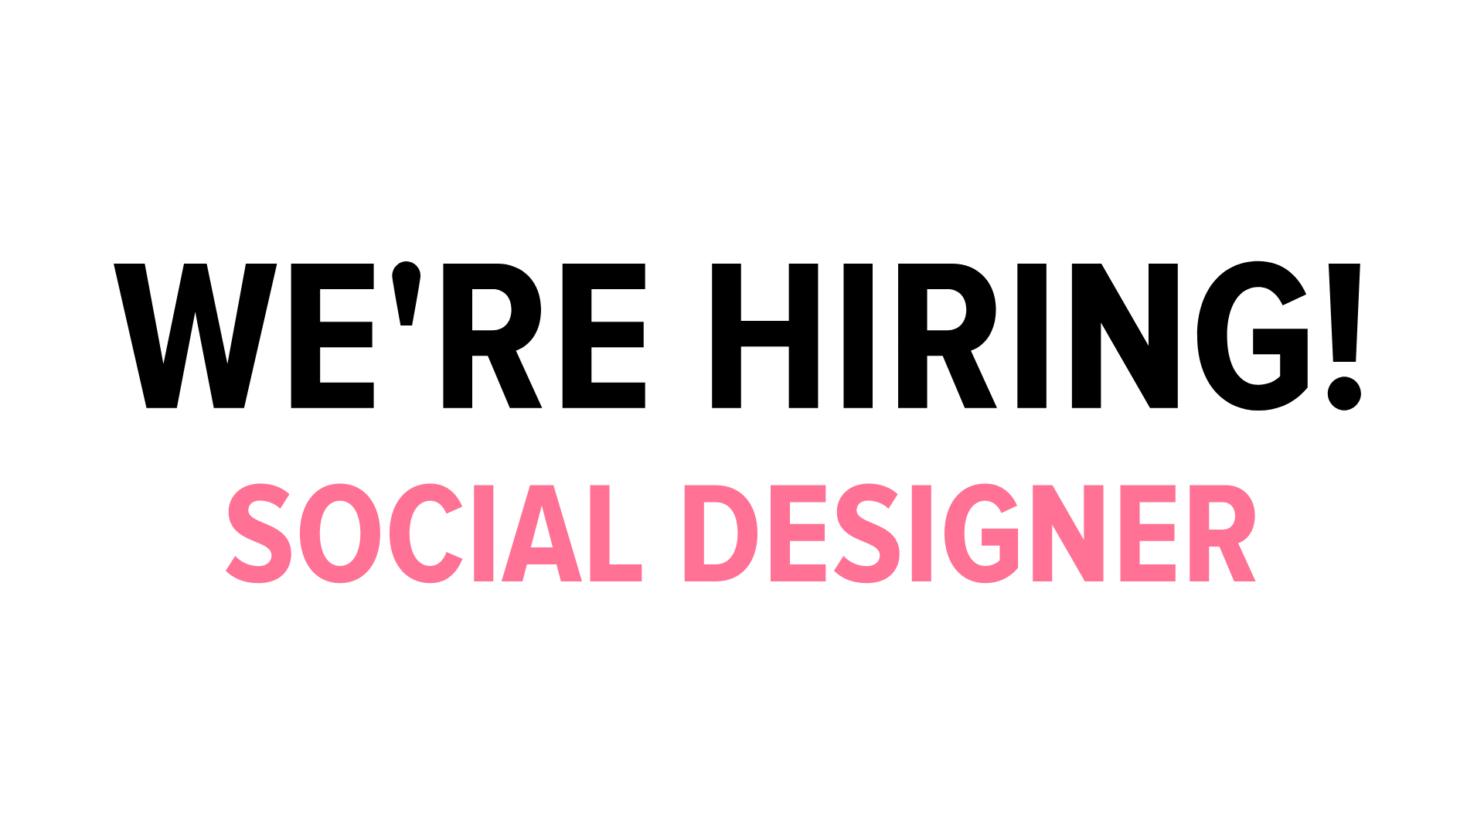 Arttenders social designer vacancy